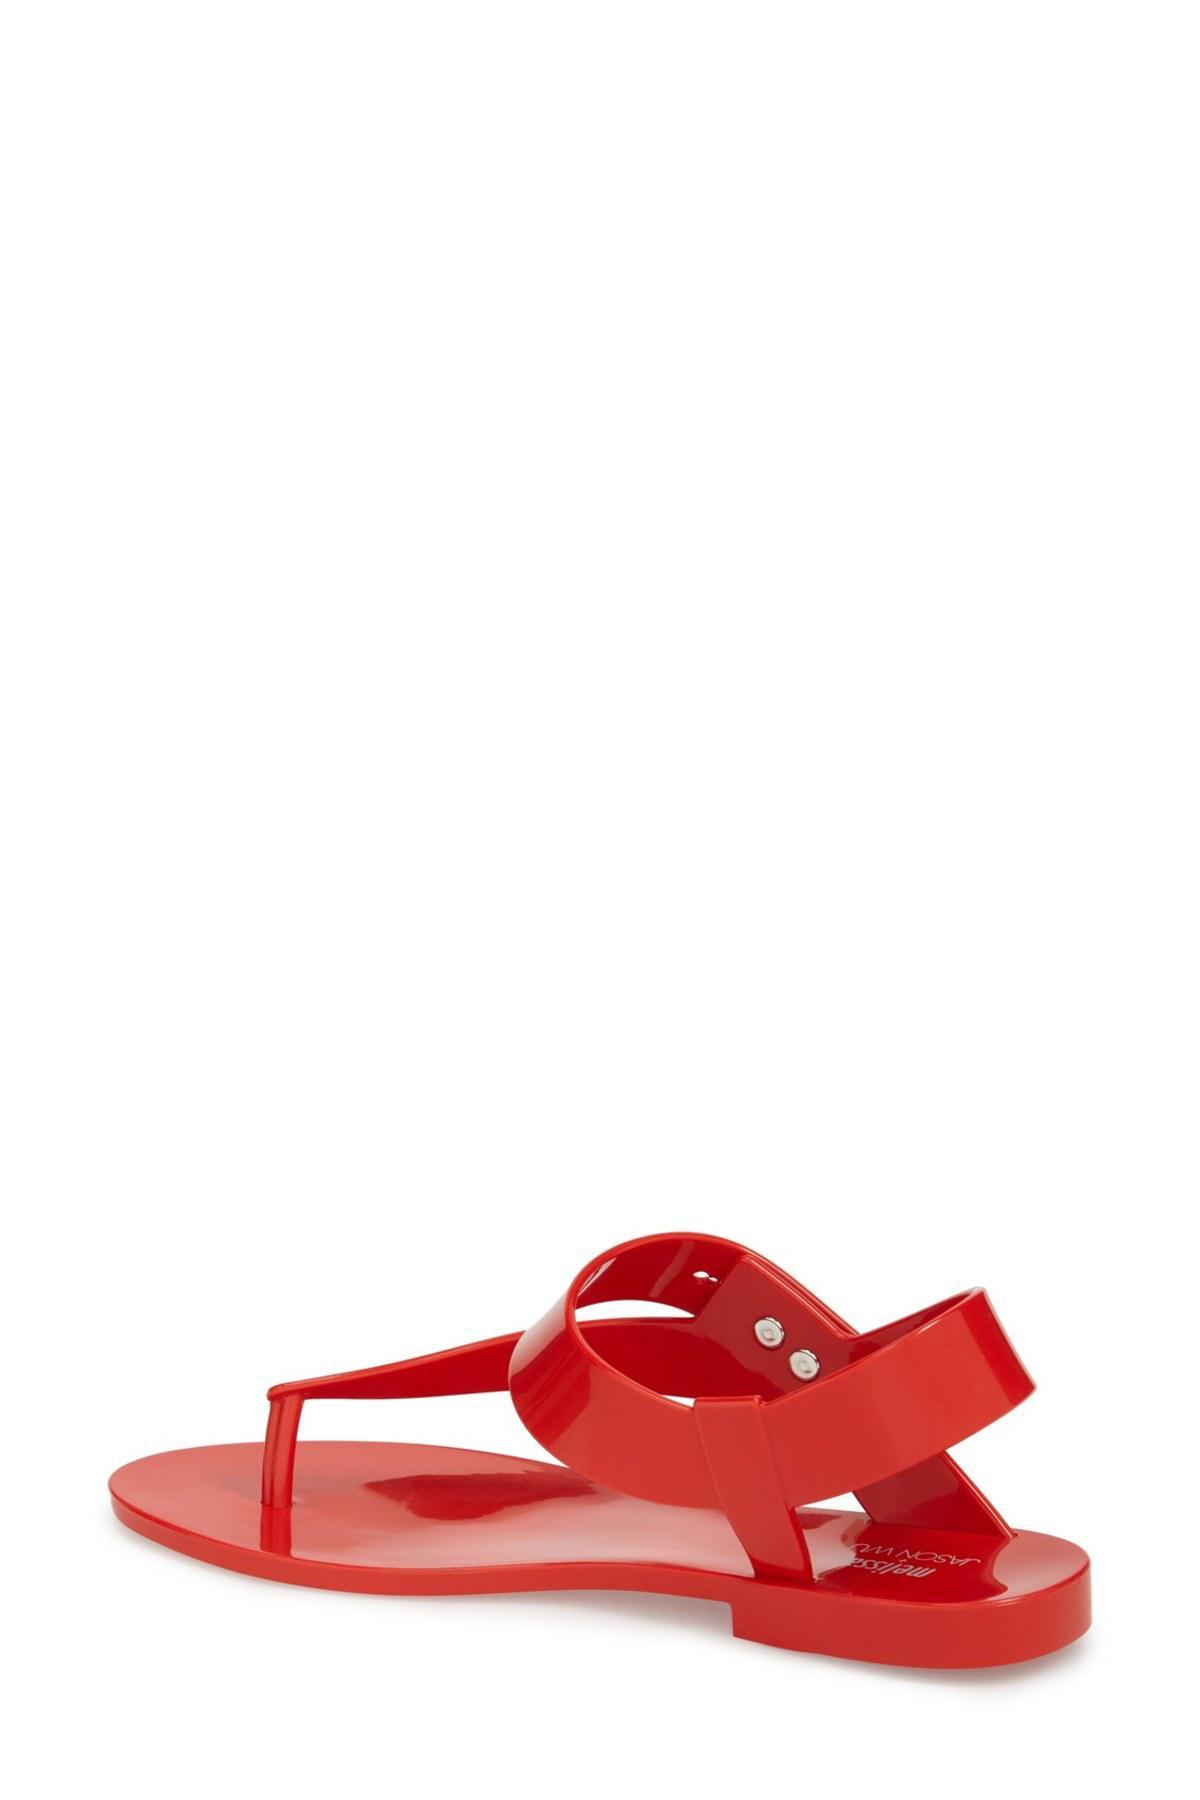 3c0be899d1f2 Lyst - Melissa X Jason Wu Asymmetrical Jelly Sandal in Red